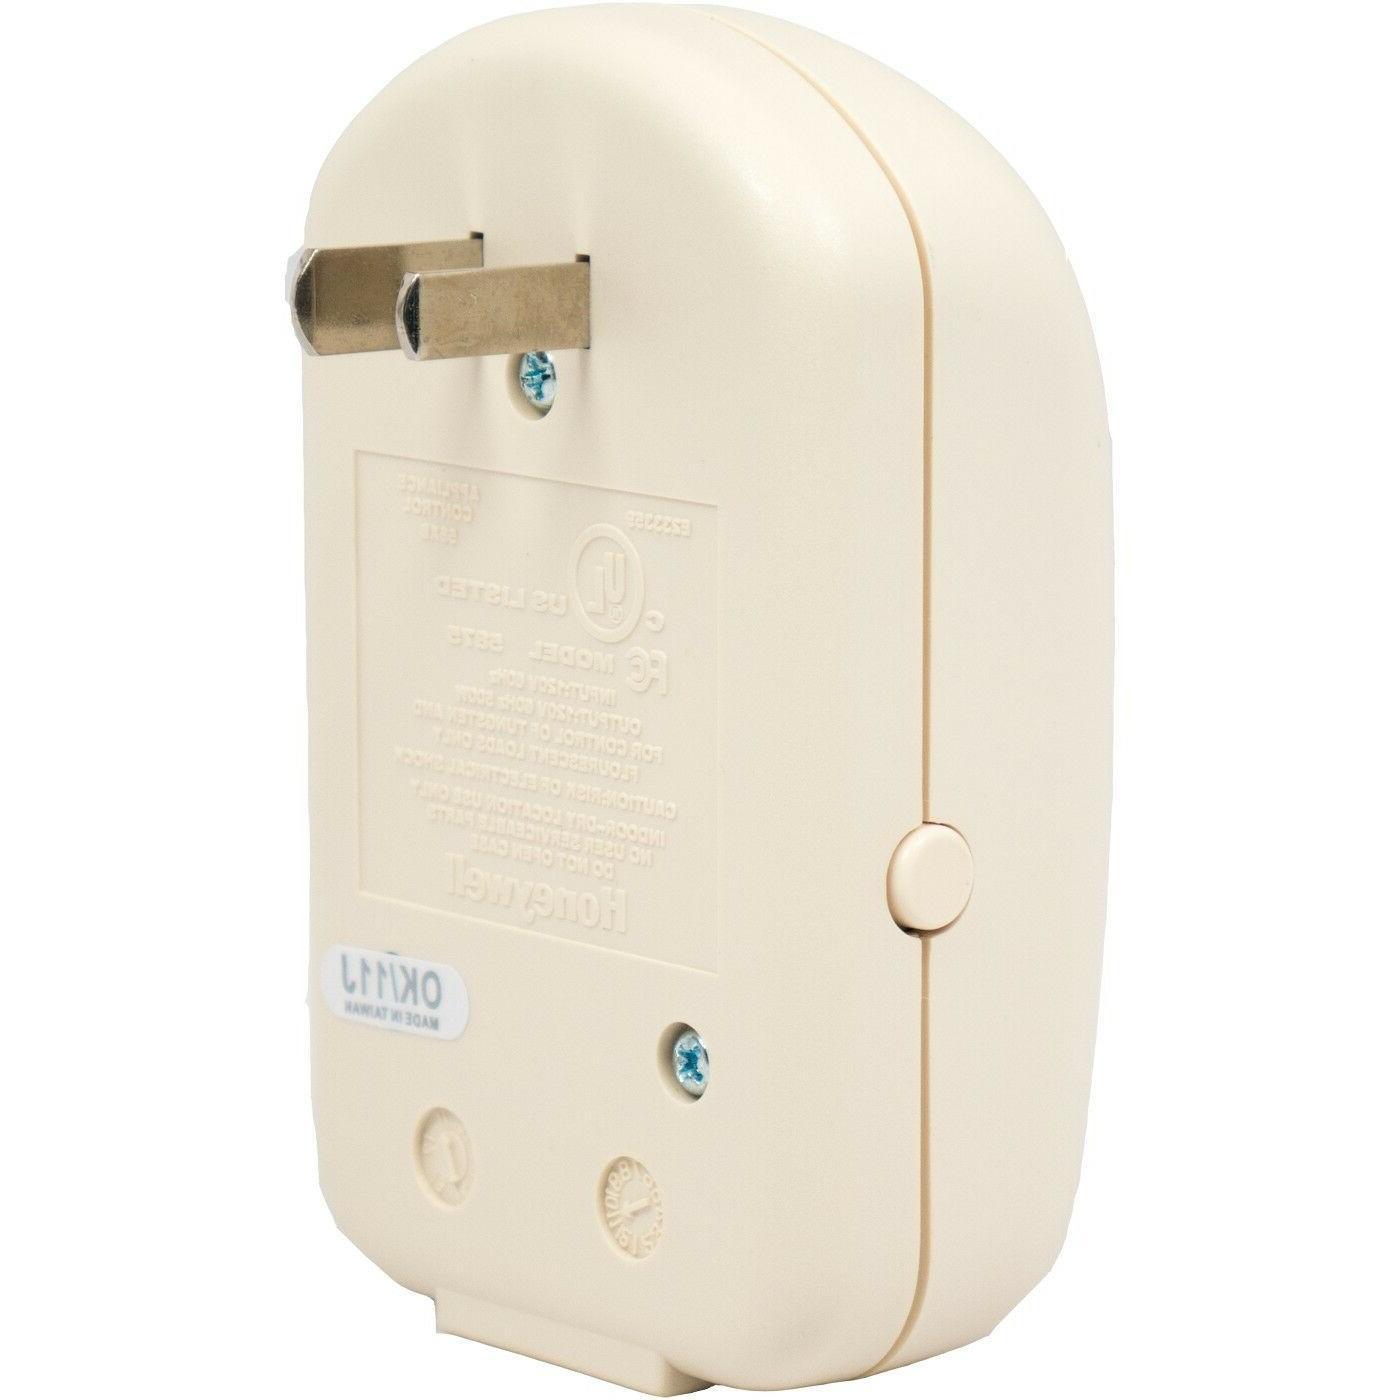 5875 wireless home automation lamp module